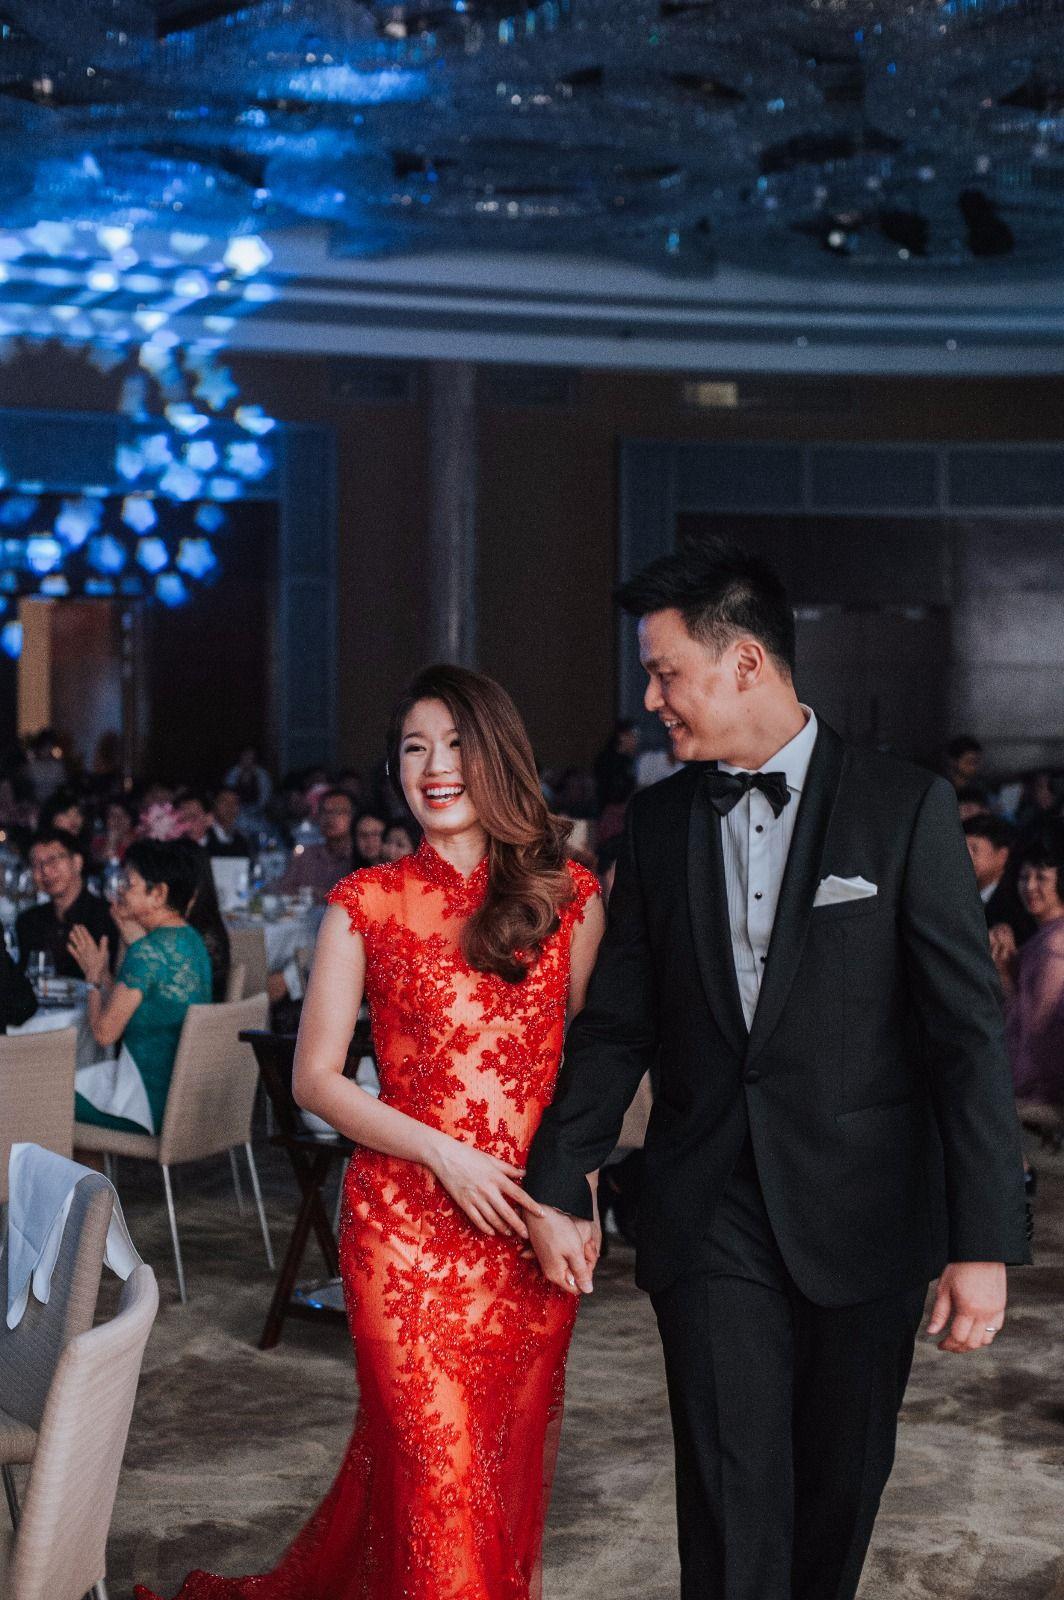 Celest Thoi Bespoke Cheongsam Qipao With Hand Beading Contact Us At Whatapps 6013 524 0026 Chinese Wedding Dress Long Train Wedding Dress Qipao Wedding [ 1600 x 1064 Pixel ]